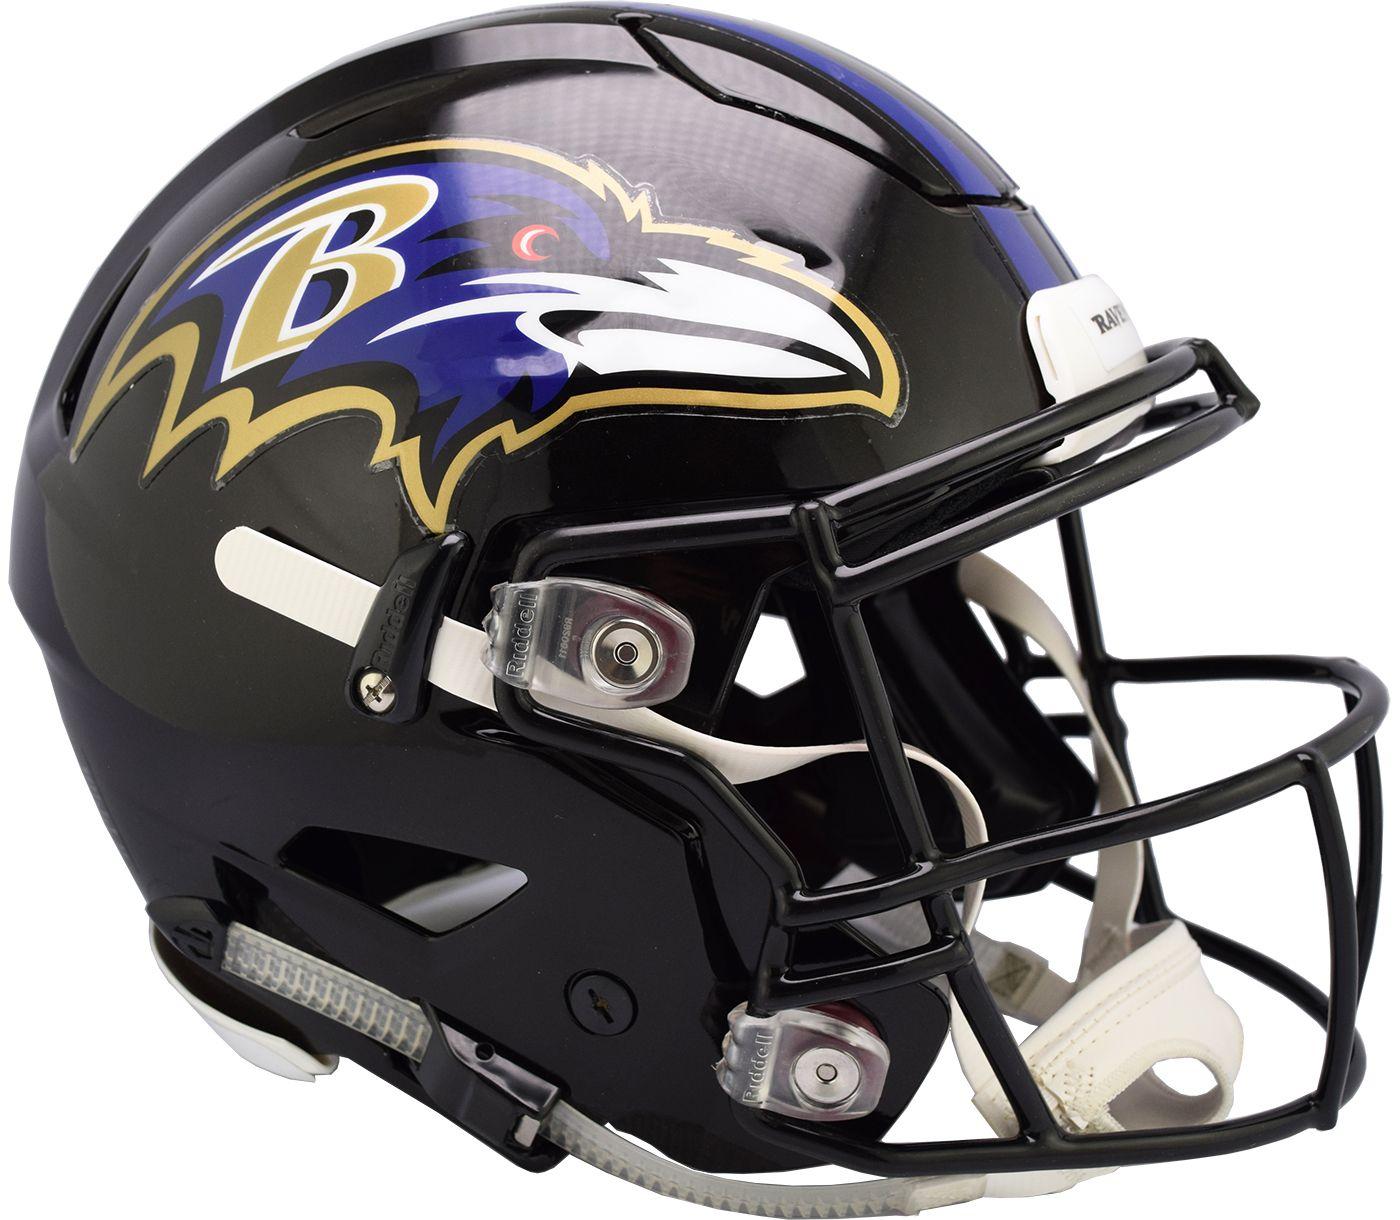 Riddell Baltimore Ravens Speed Flex Authentic Football Helmet